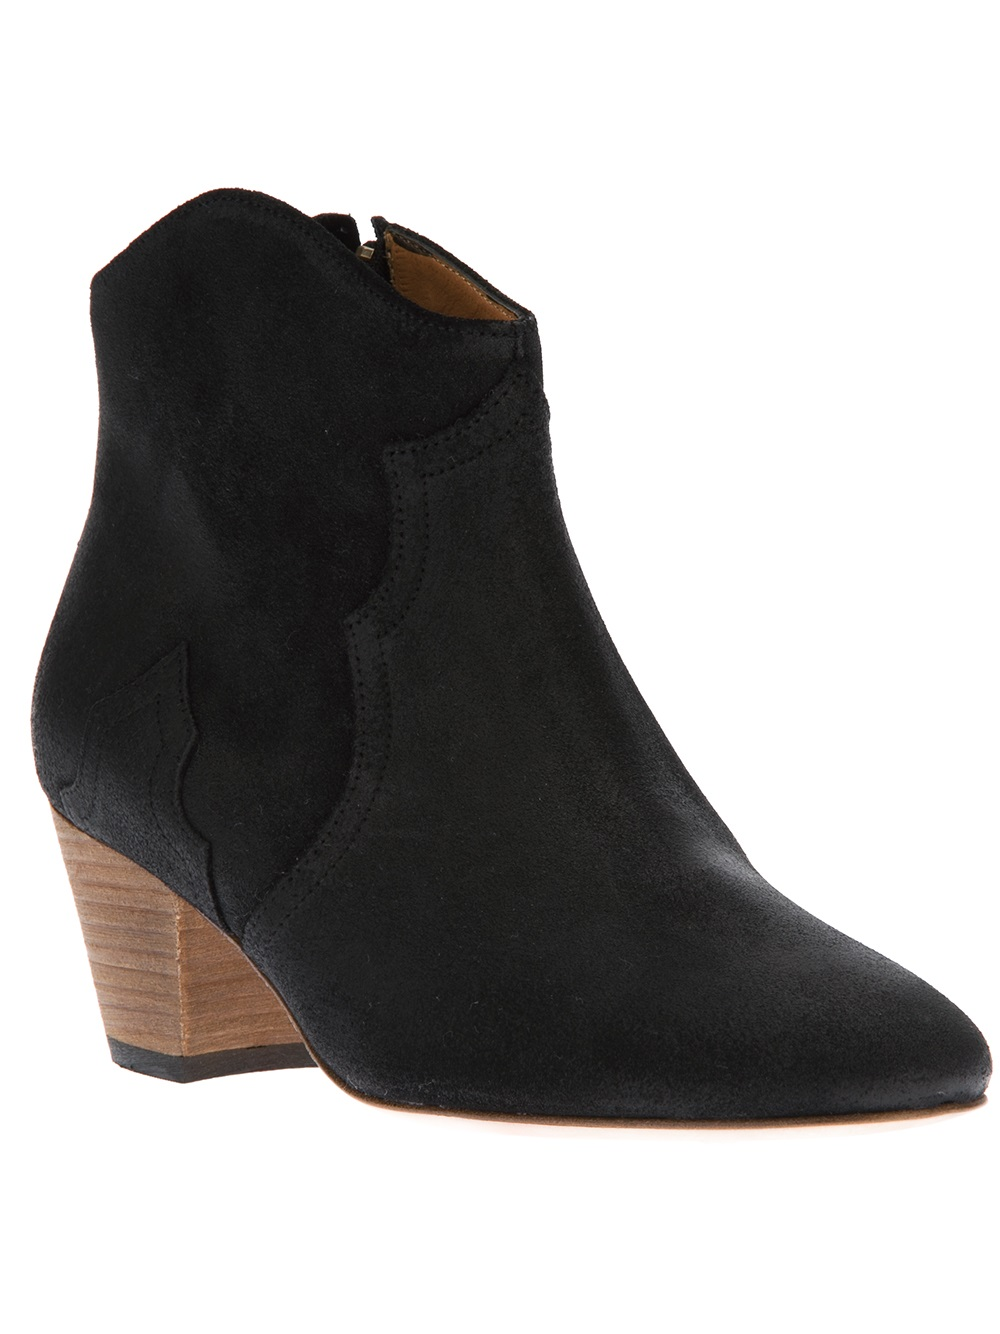 isabel marant dicker boot in black lyst. Black Bedroom Furniture Sets. Home Design Ideas